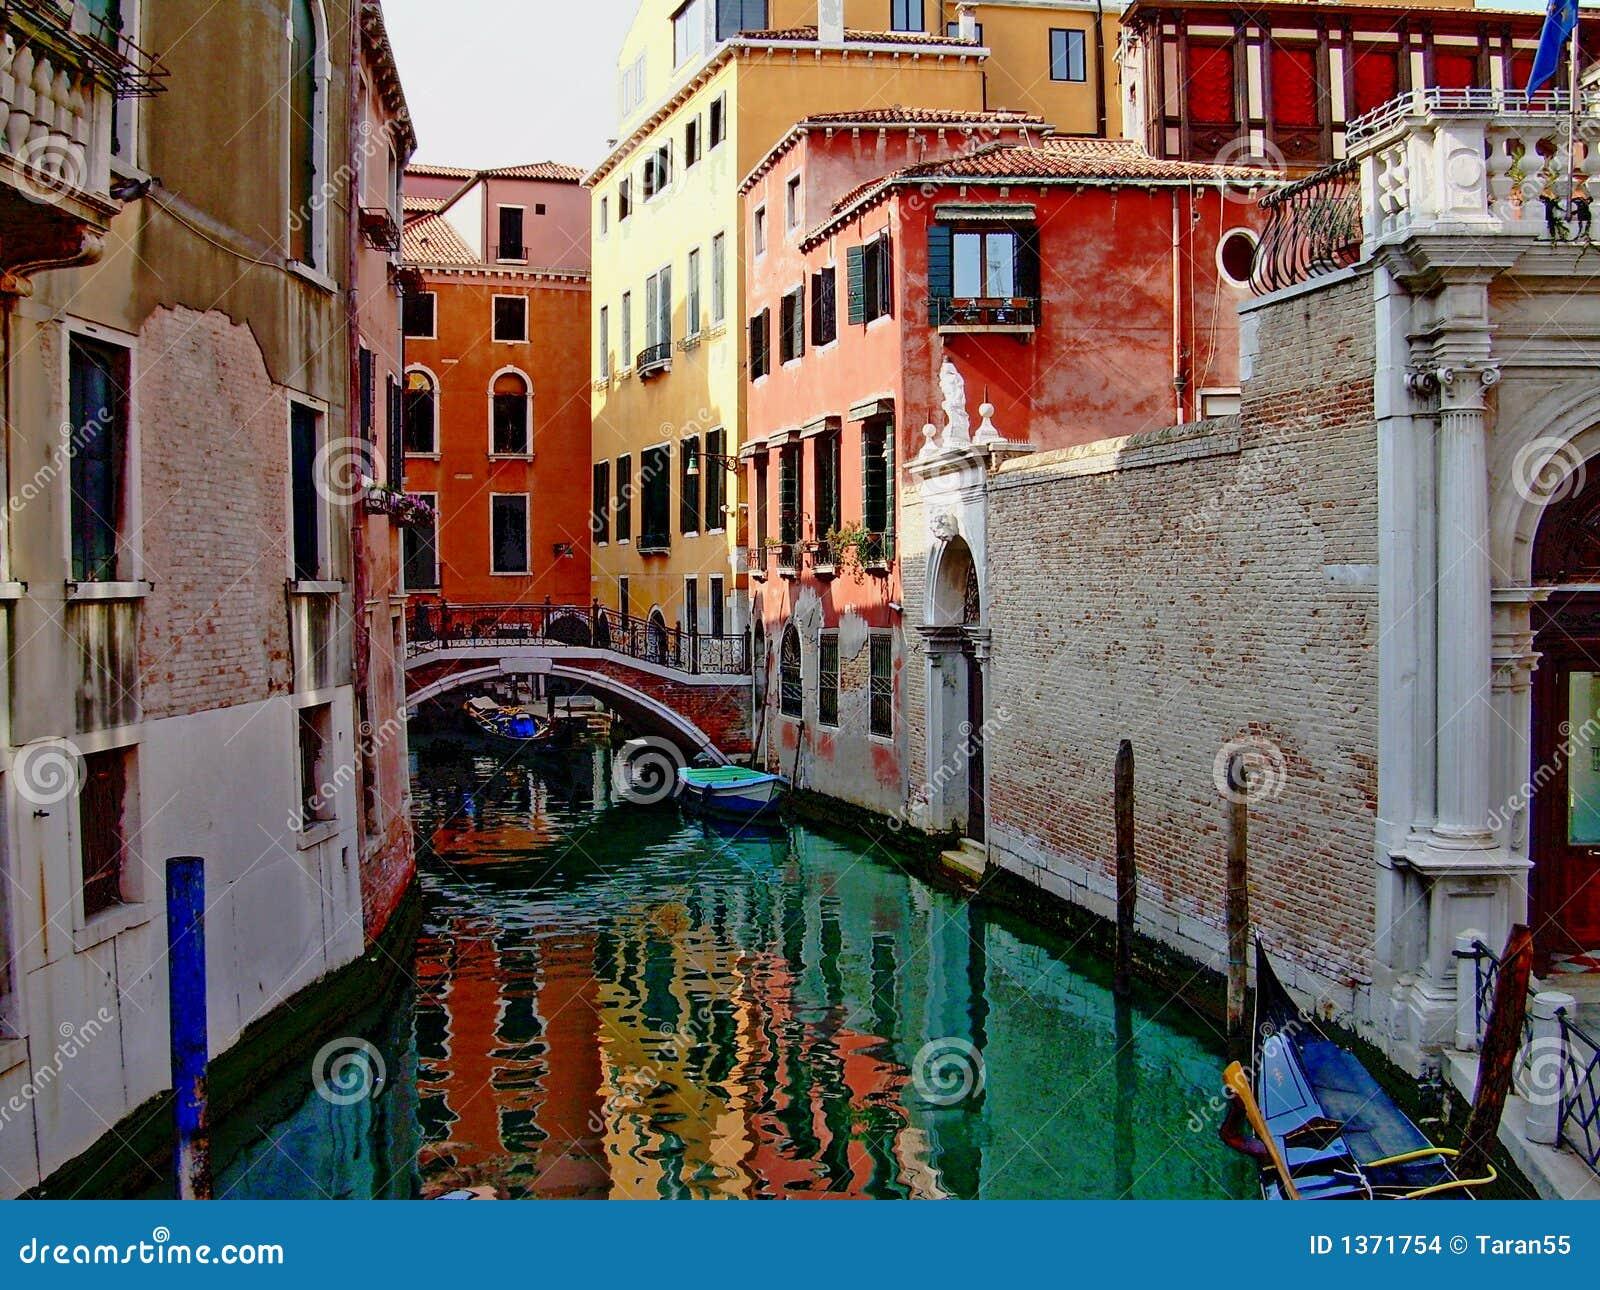 Beautiful canale of Venice